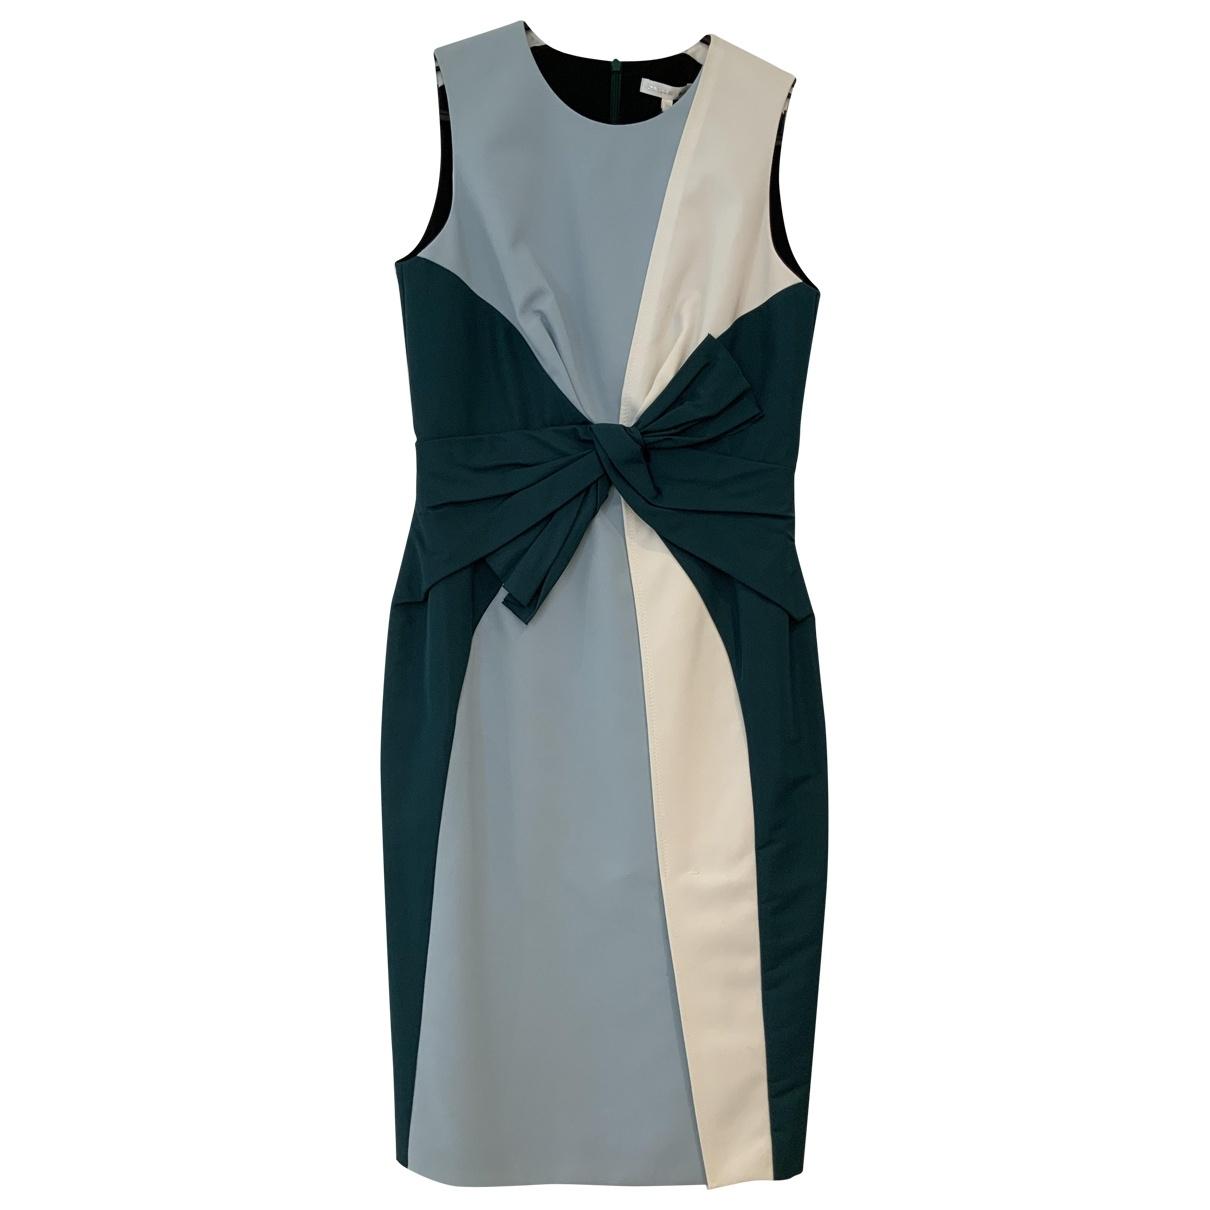 Paule Ka \N Turquoise Cotton dress for Women 36 FR